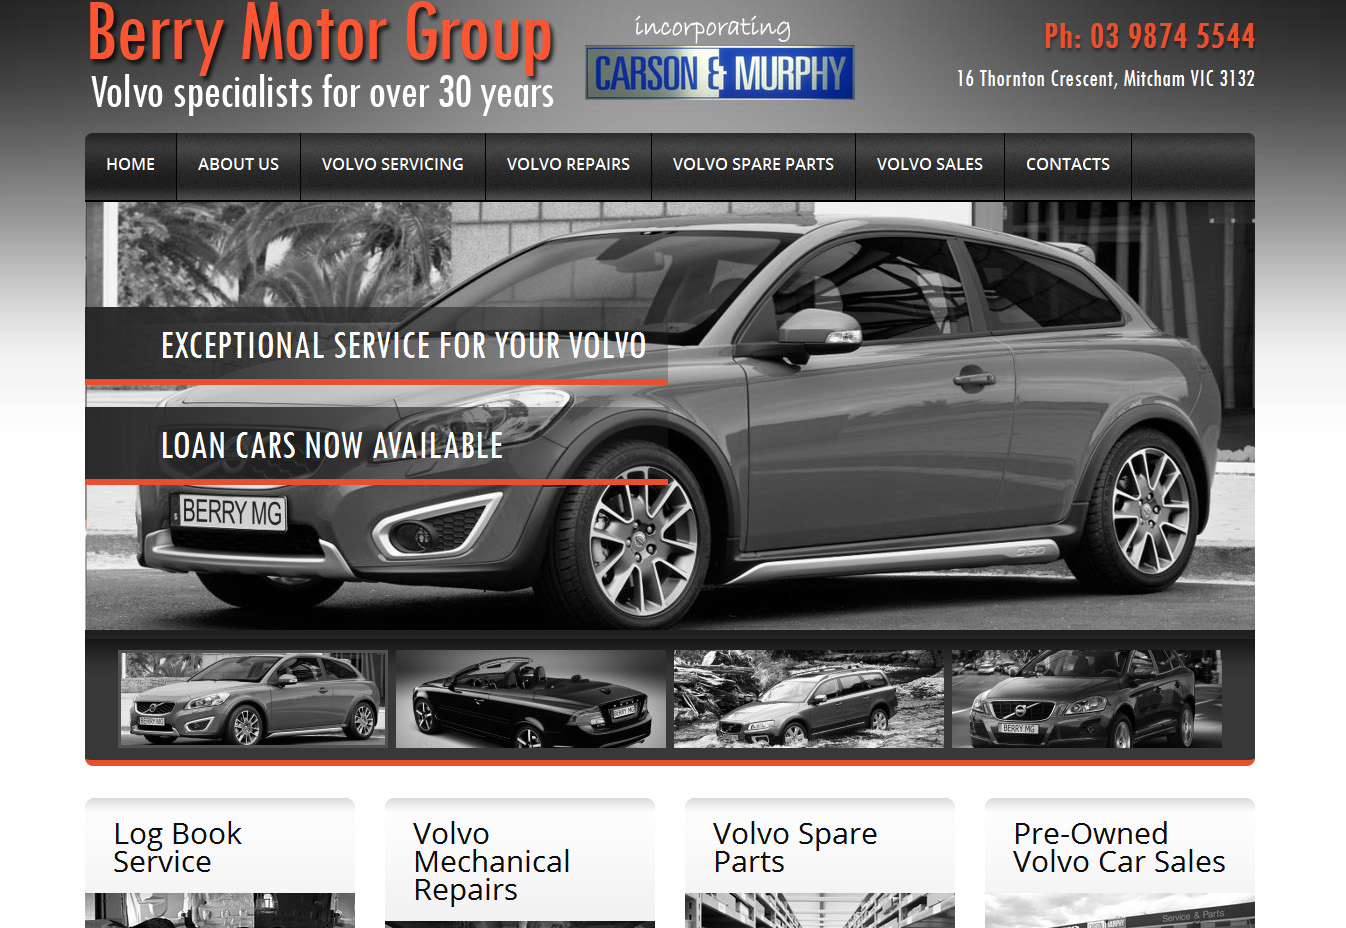 371864-Berry Motor Group website